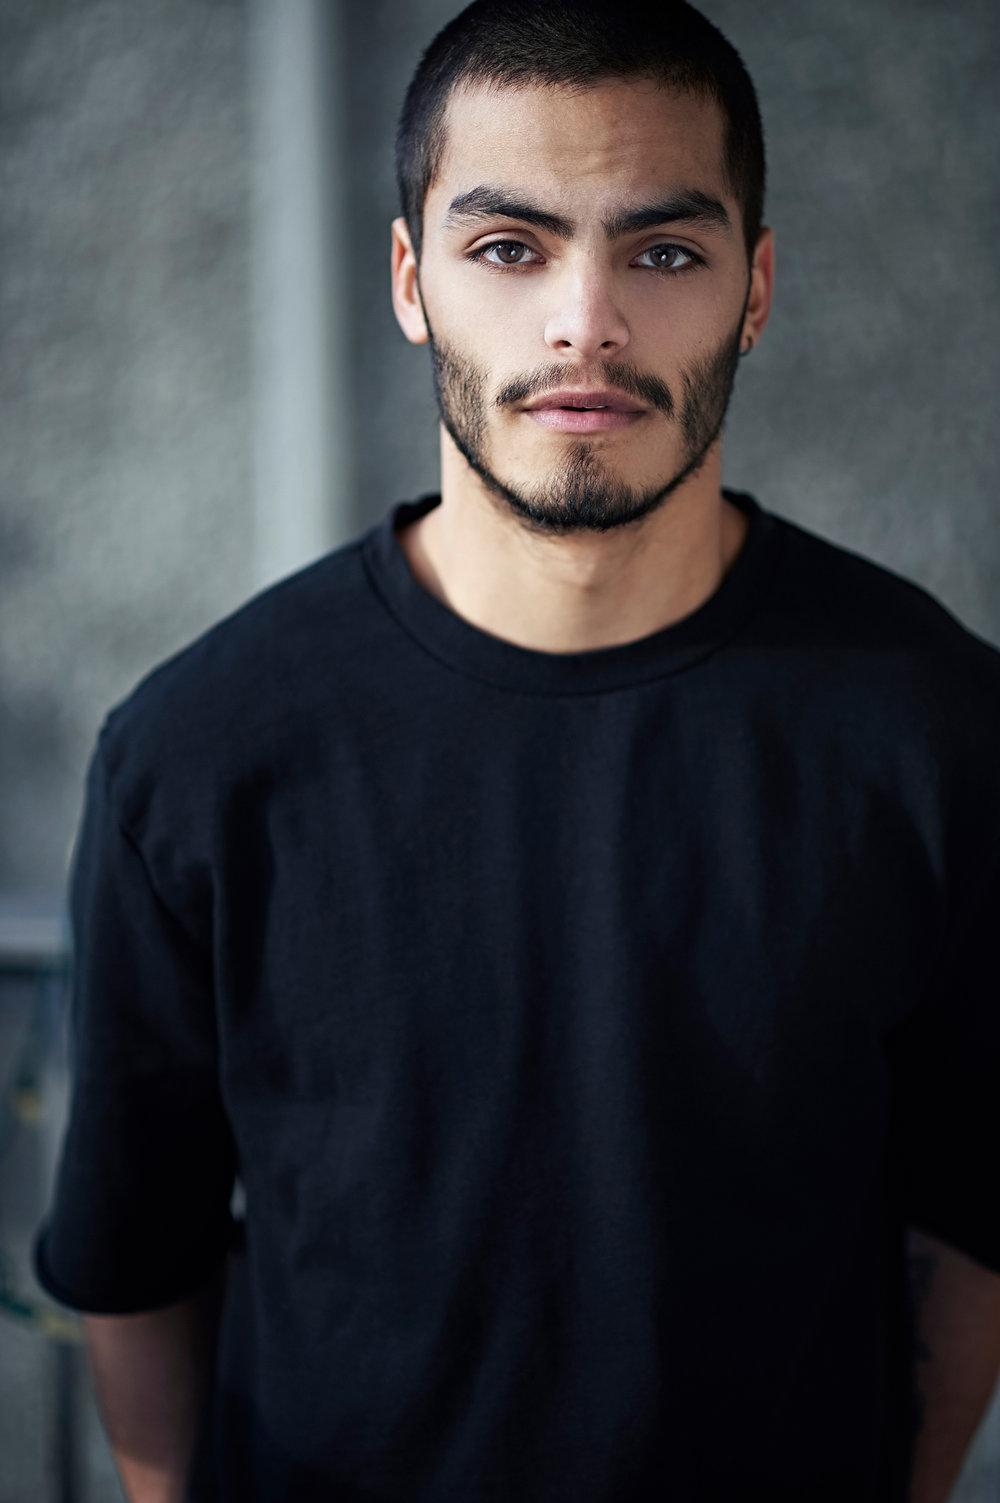 Nicolas Ventura | Addo Platform Co-Founder